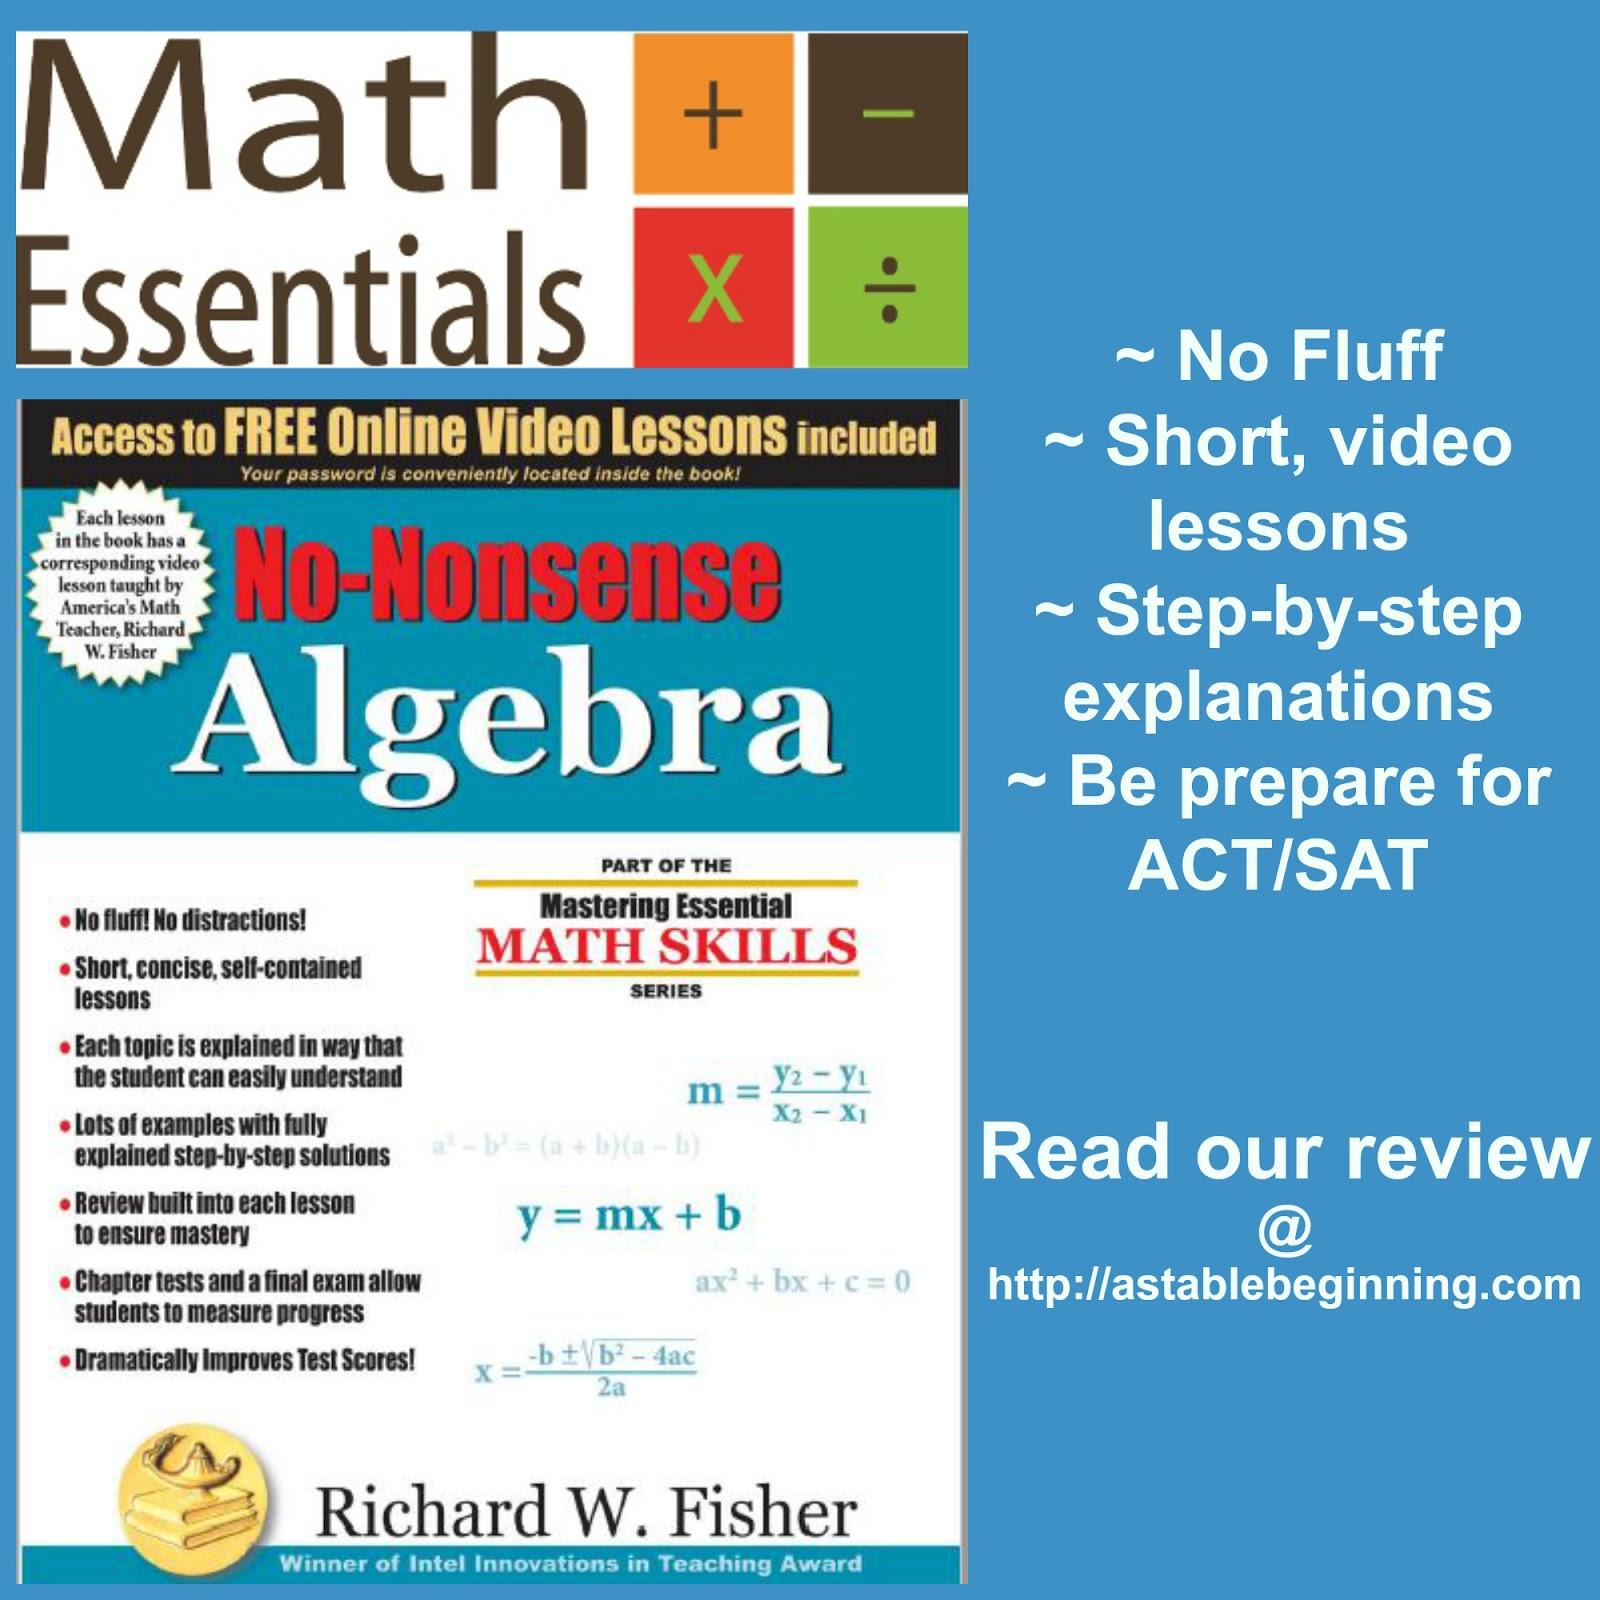 A Stable Beginning: Math Essentials: No-Nonsense Algebra ~ a TOS review